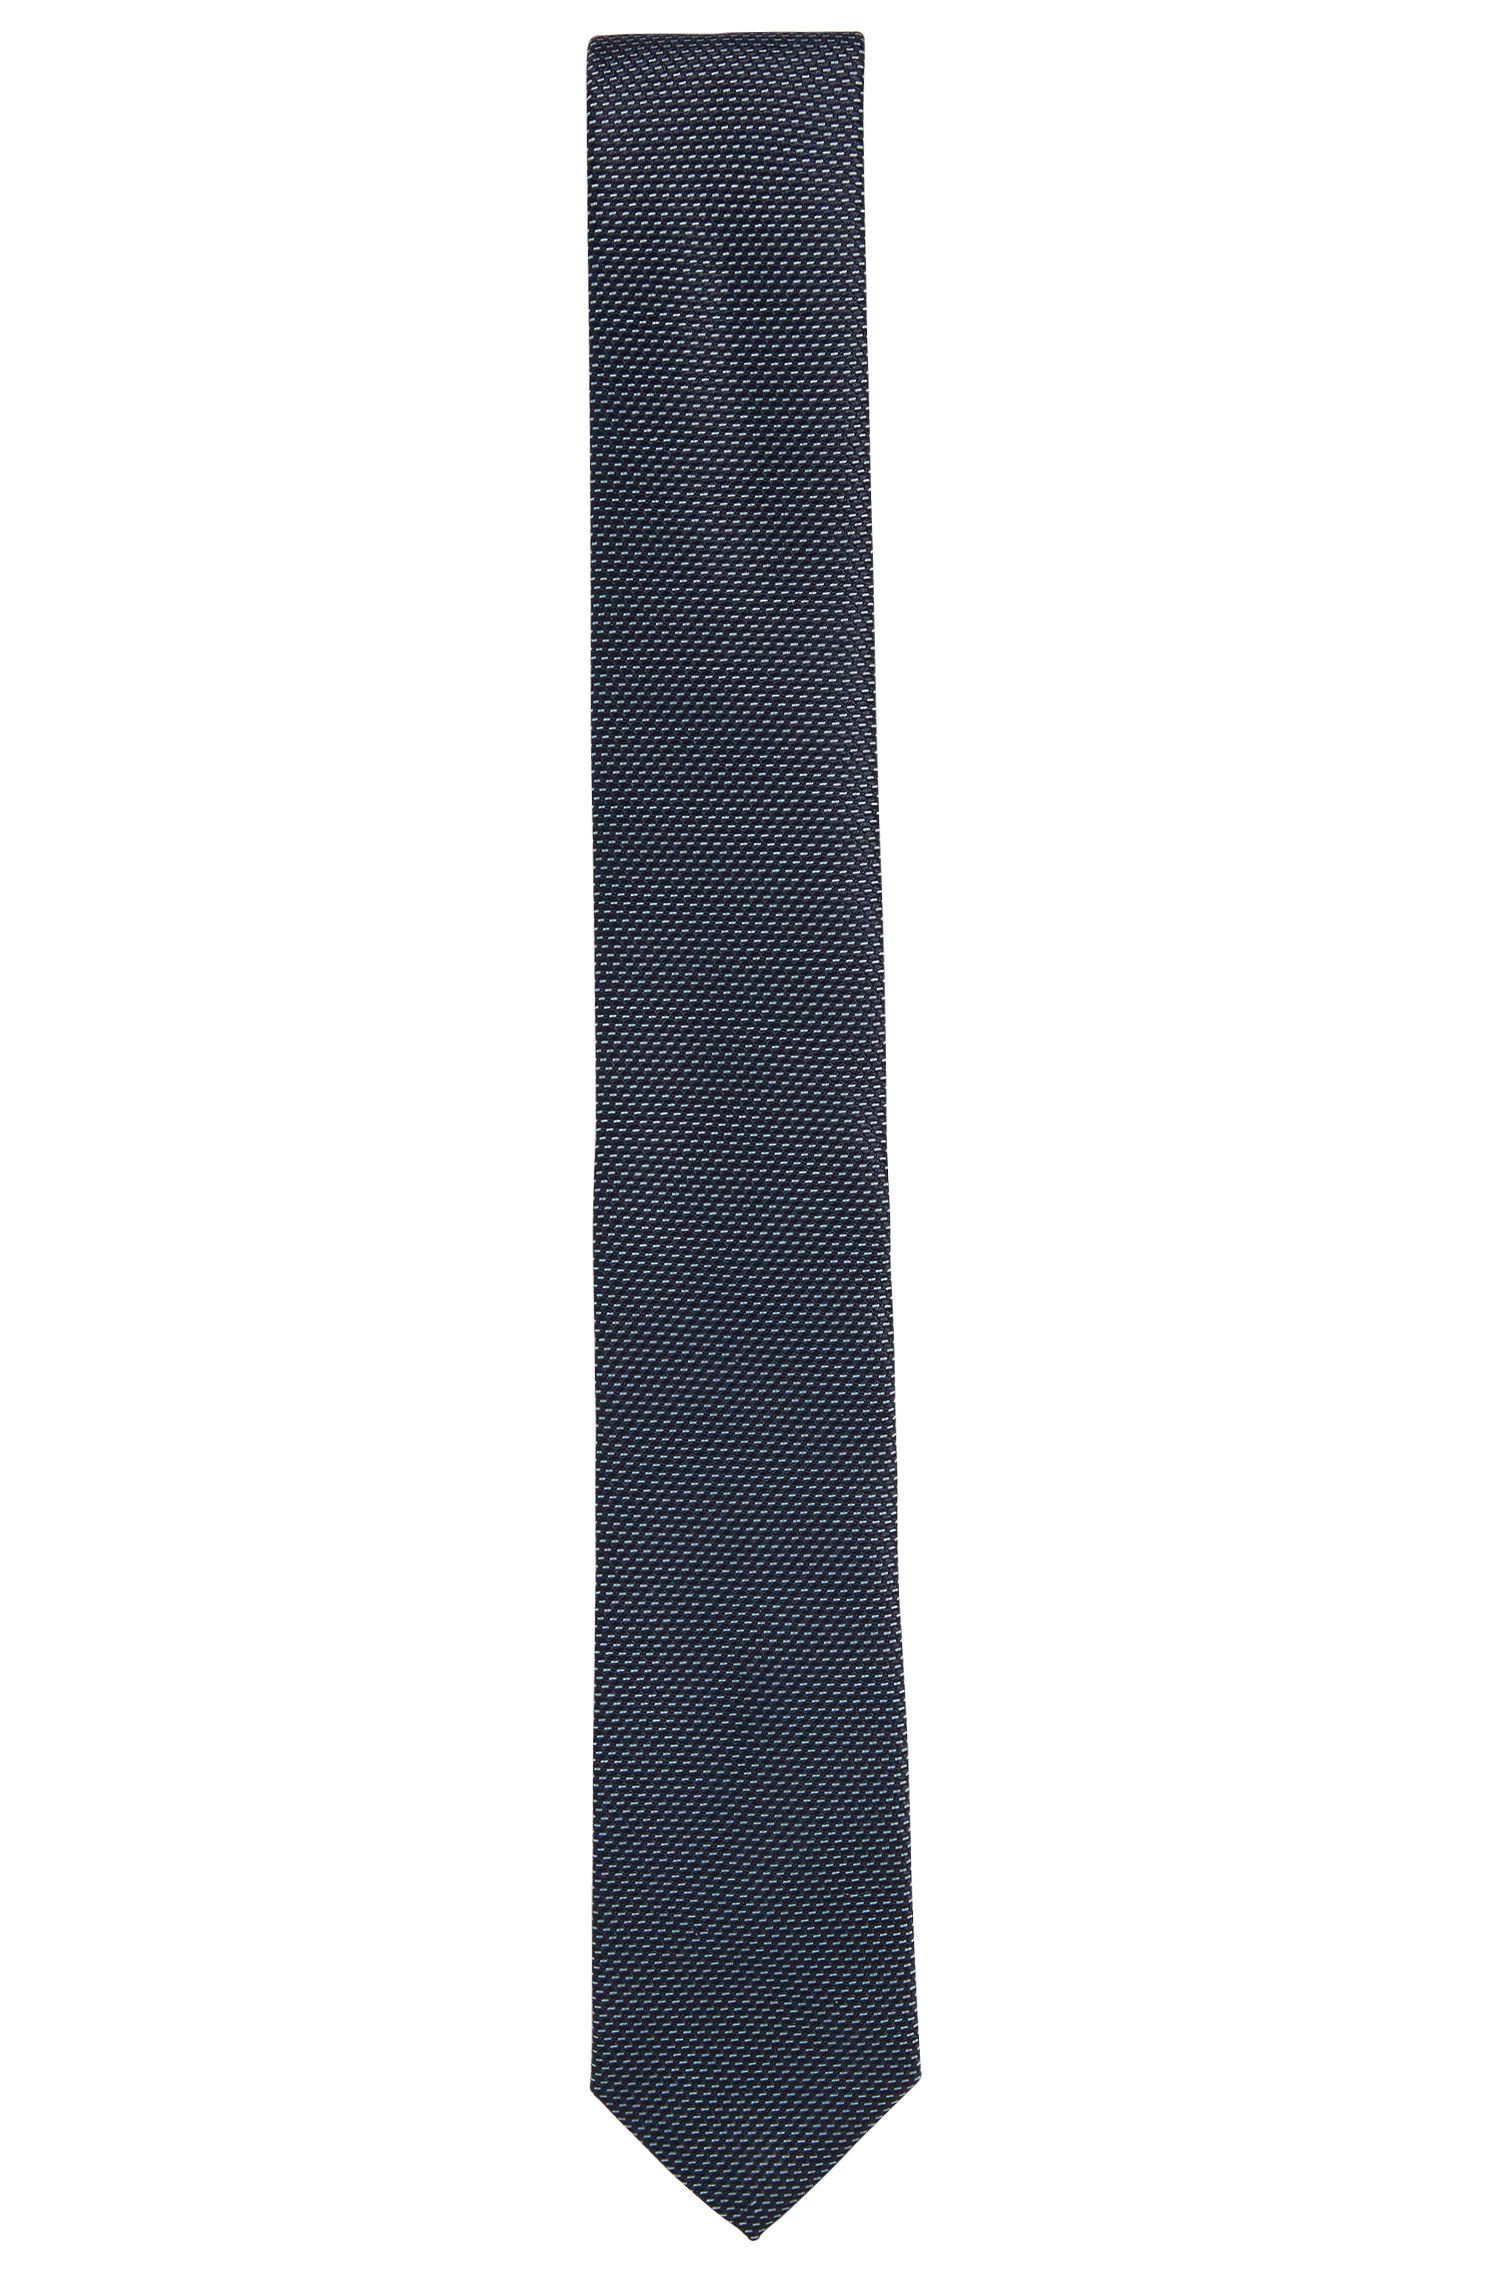 Corbata de seda con microestampado de dos tonos